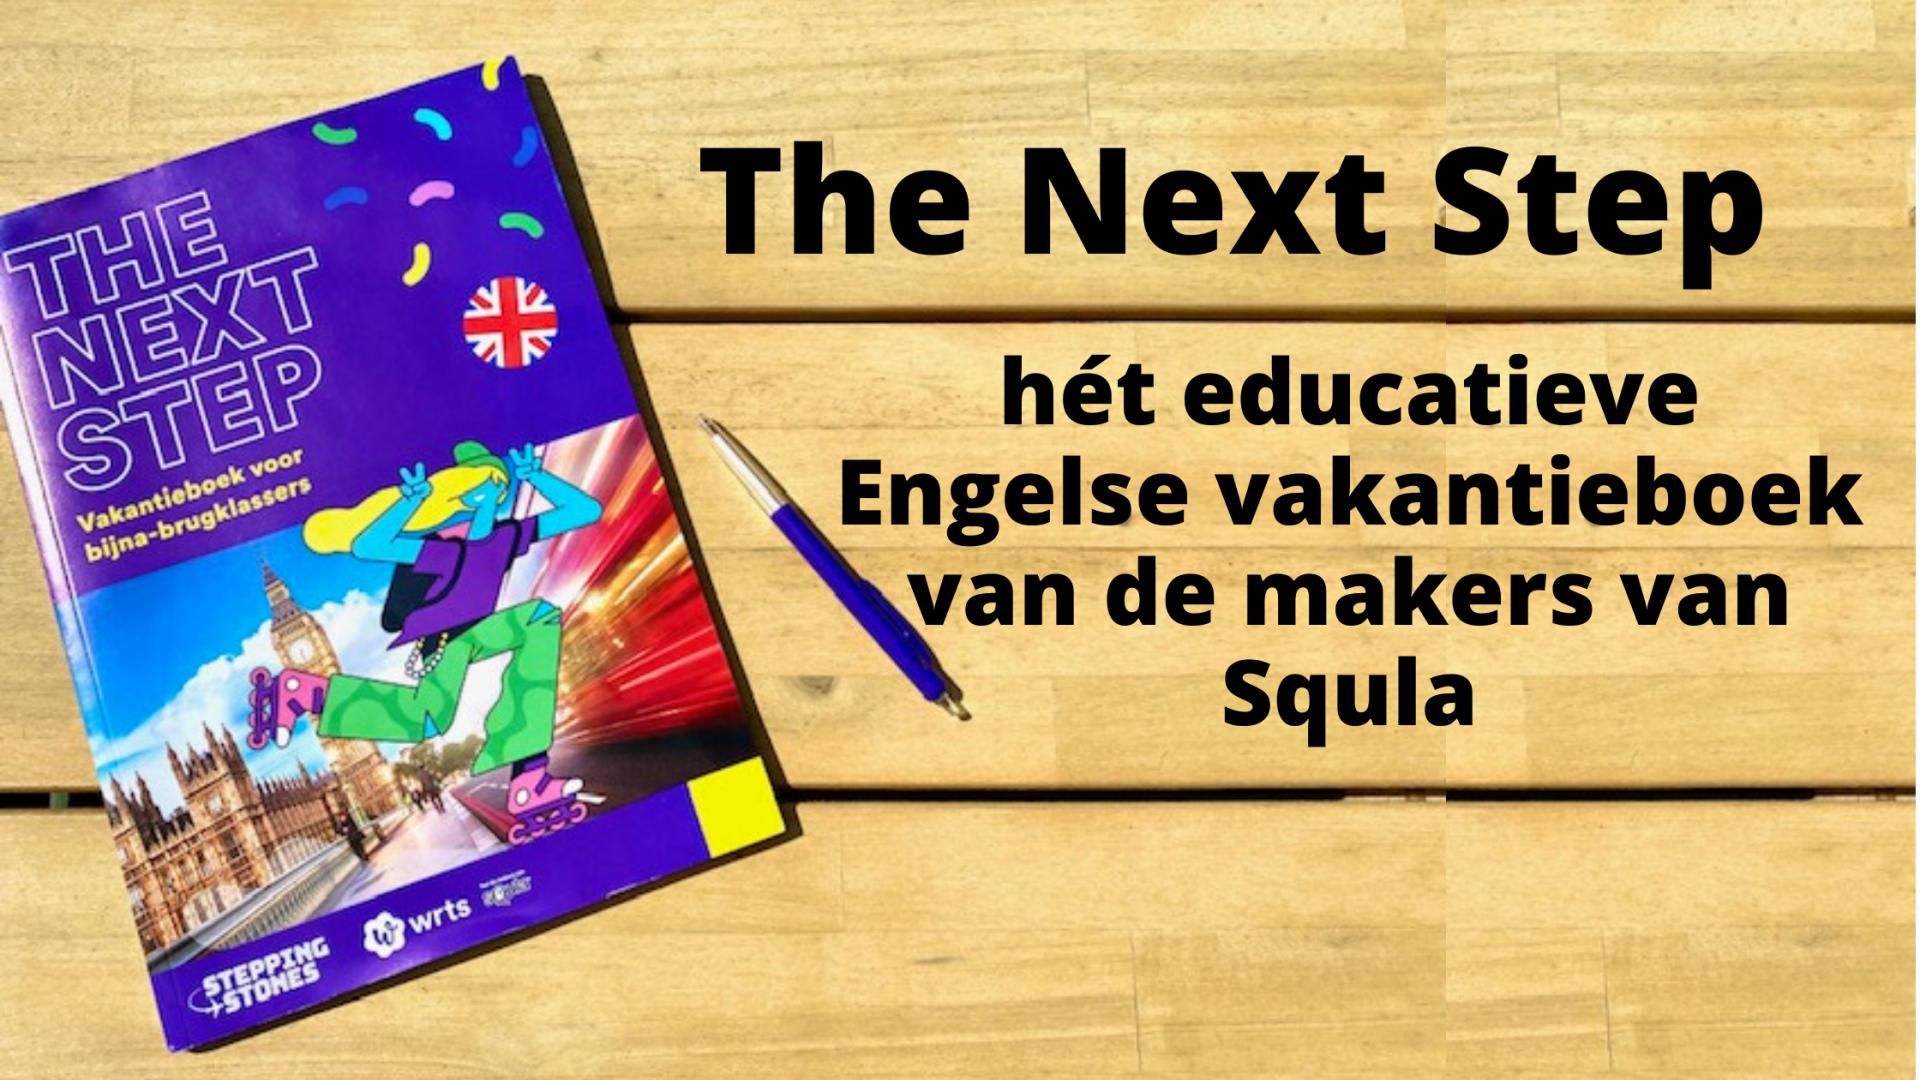 The Next Step - hét educatieve Engelse vakantieboek